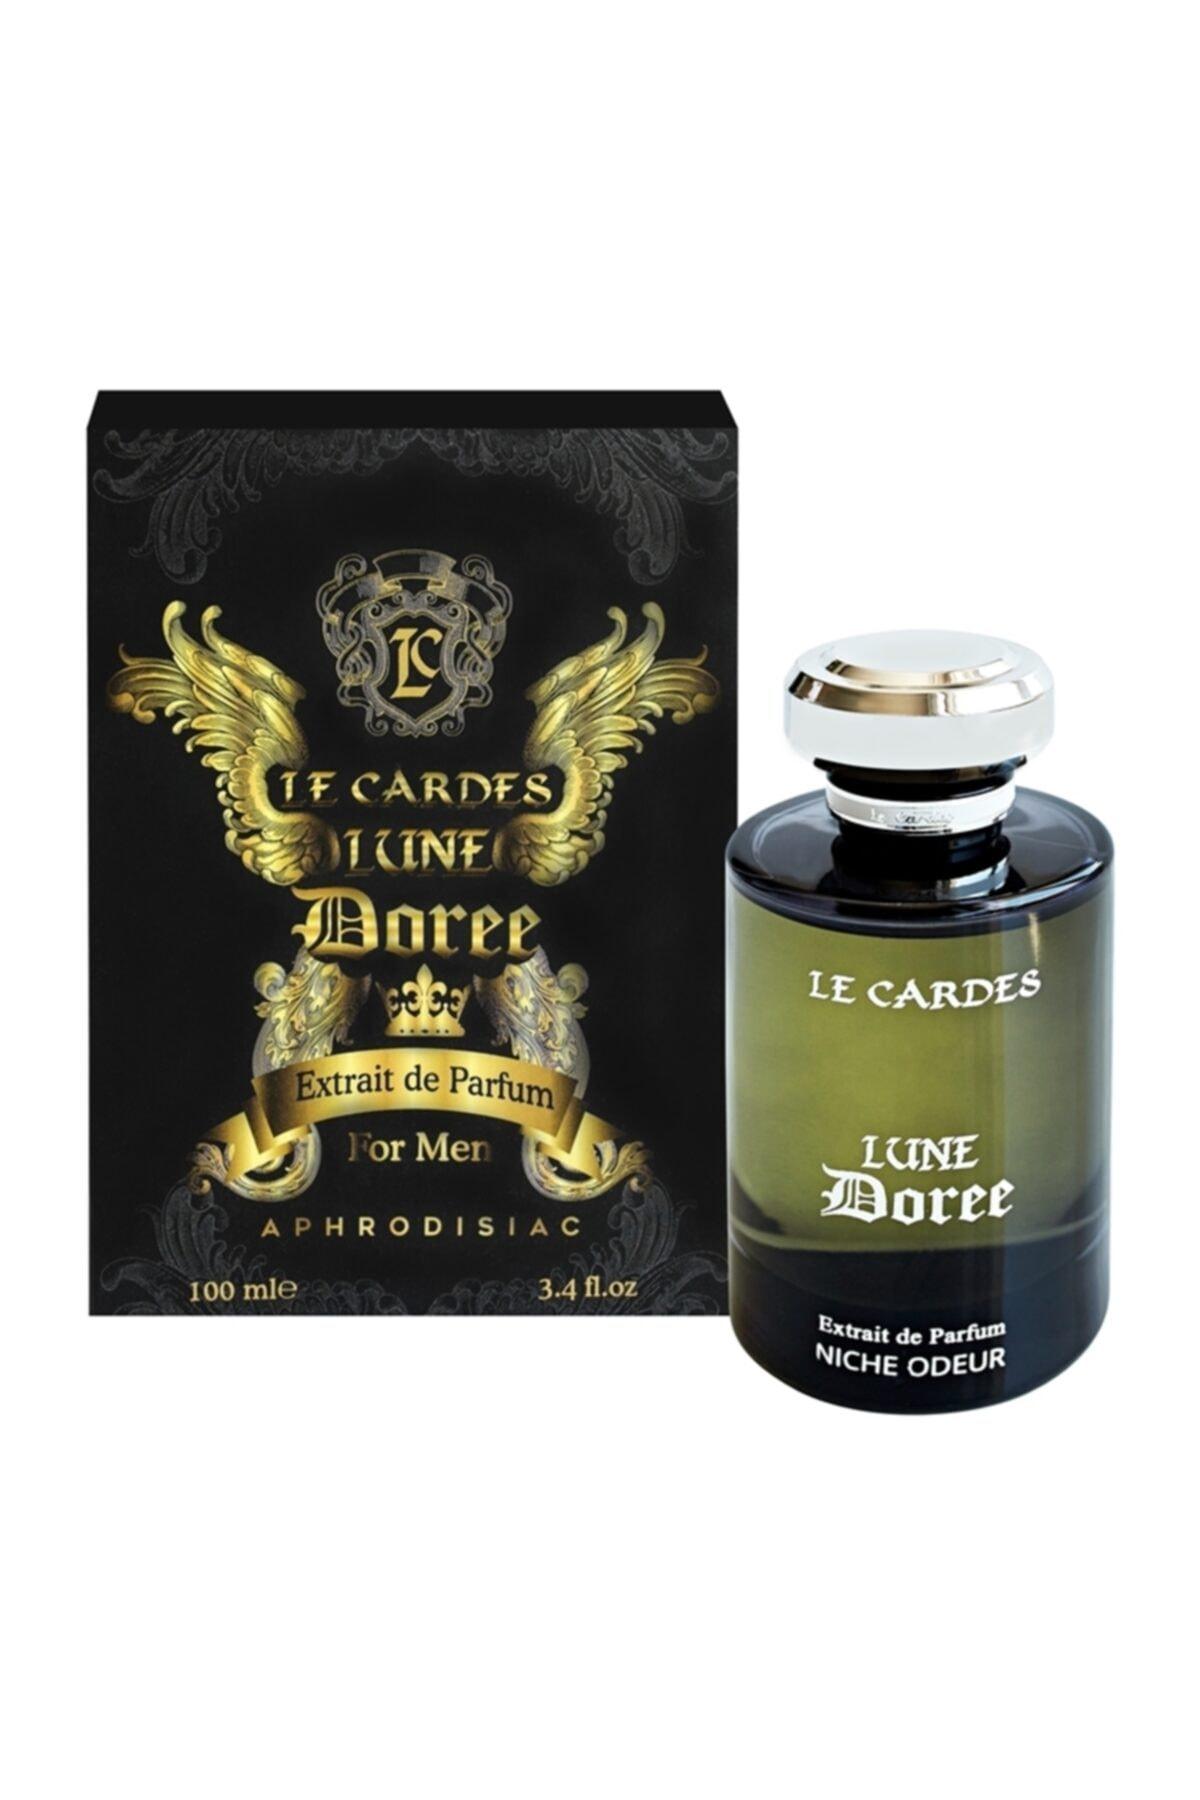 Le Cardes Lune Doree Afrodizyak Edp 100 ml Erkek Parfüm 2